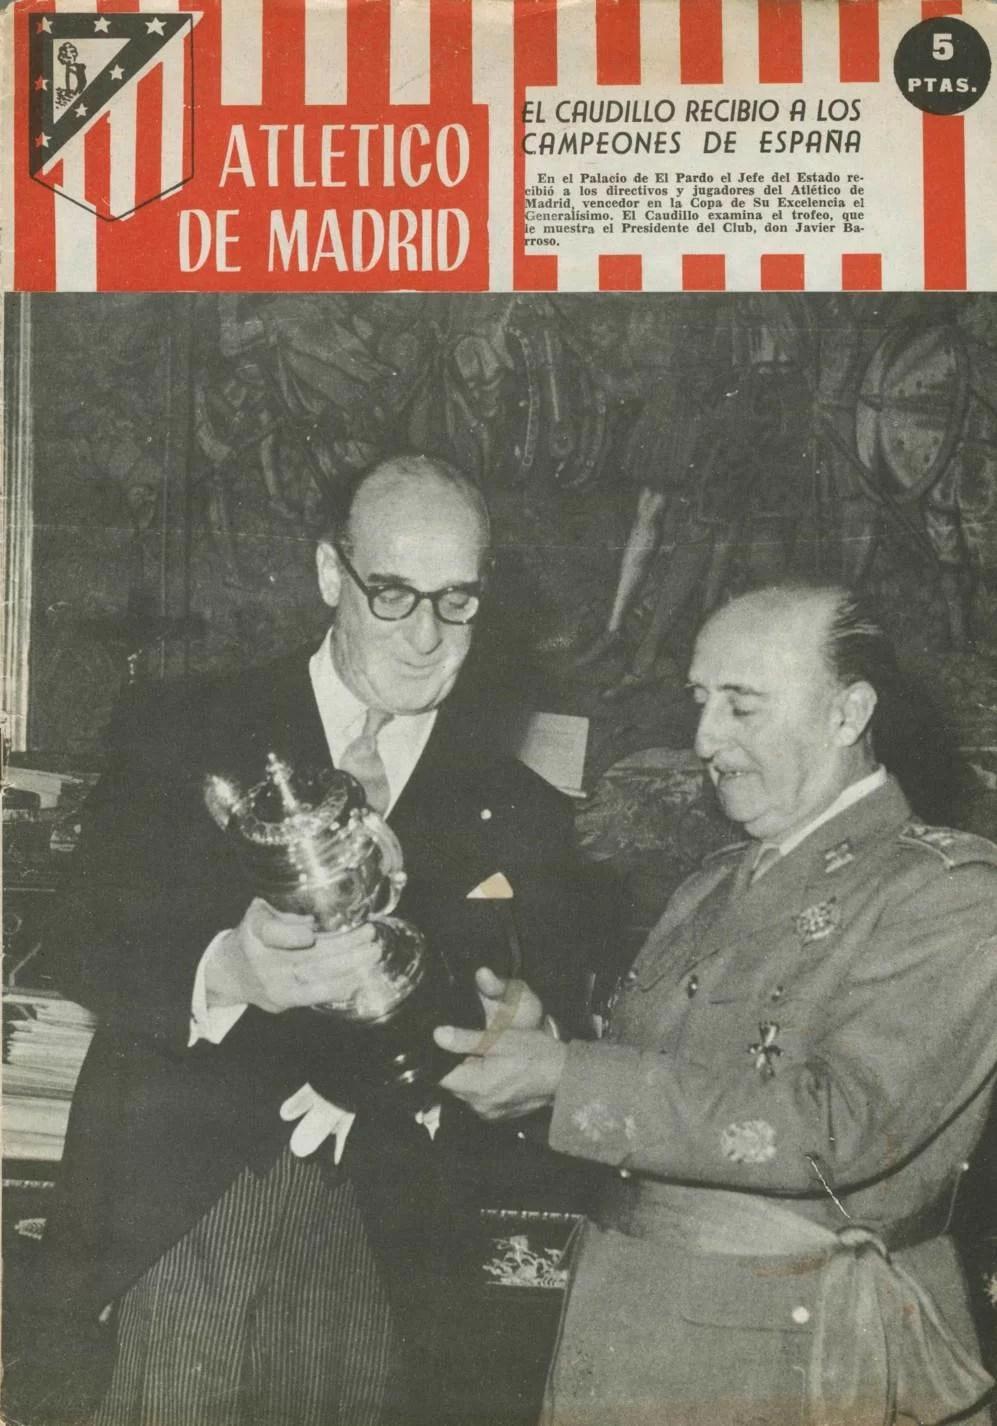 Francisco Franco riceve la squadra campione di Spagna. www.elmundo.es